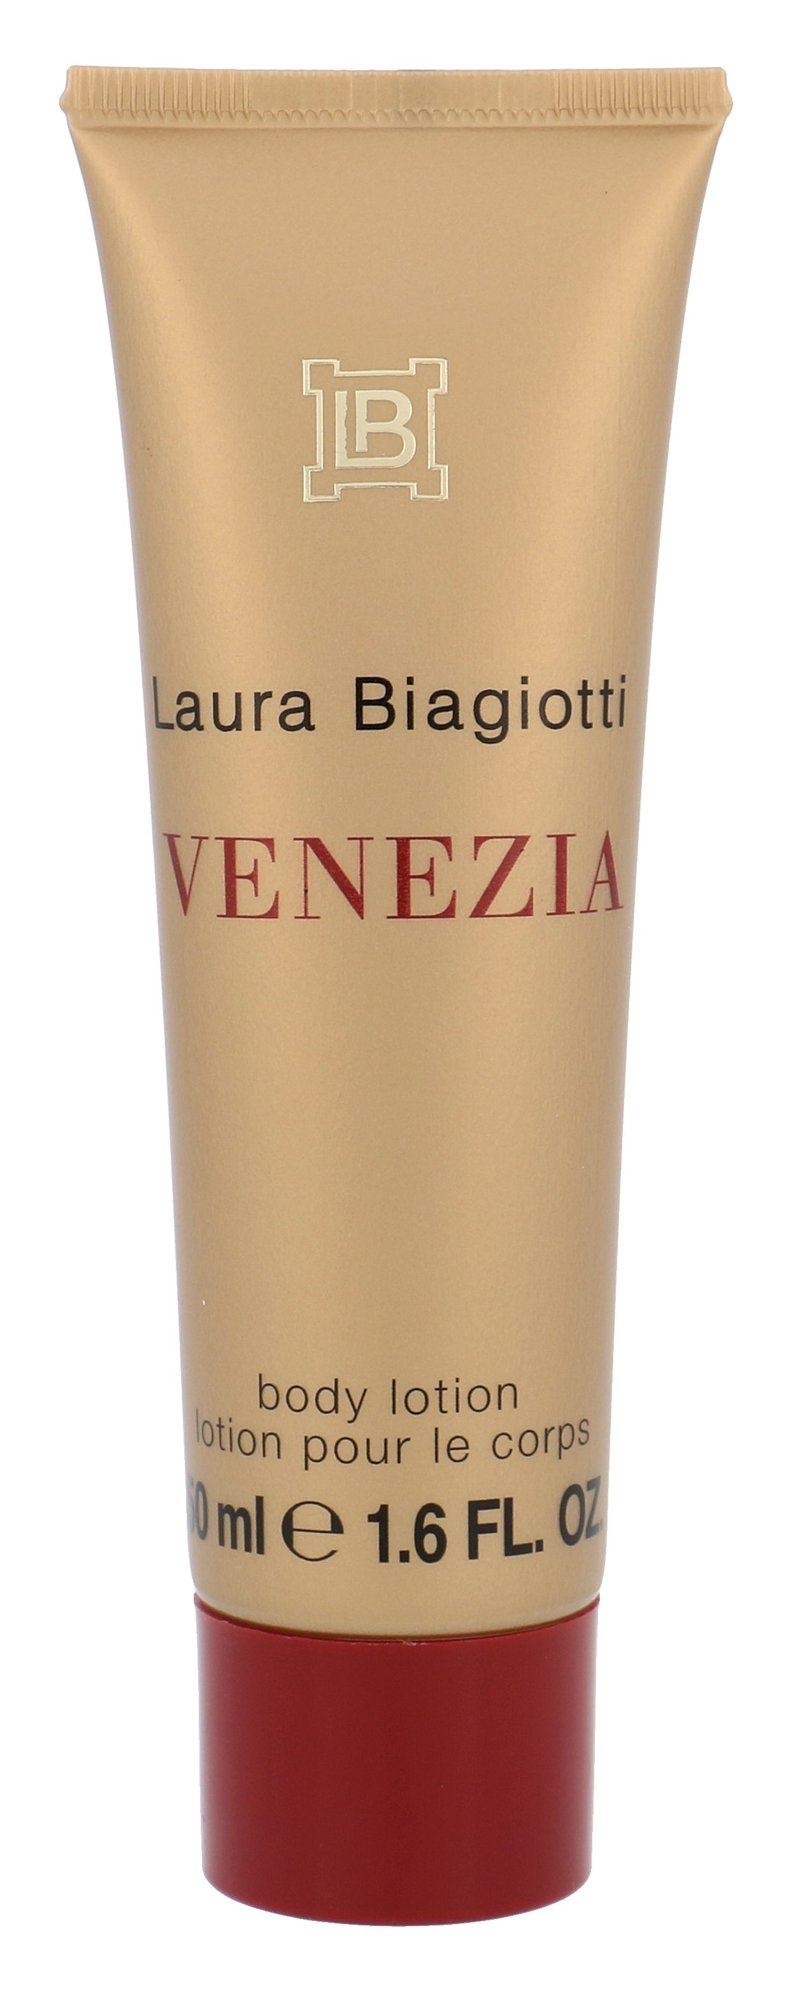 Kūno losjonas Laura Biagiotti Venezia